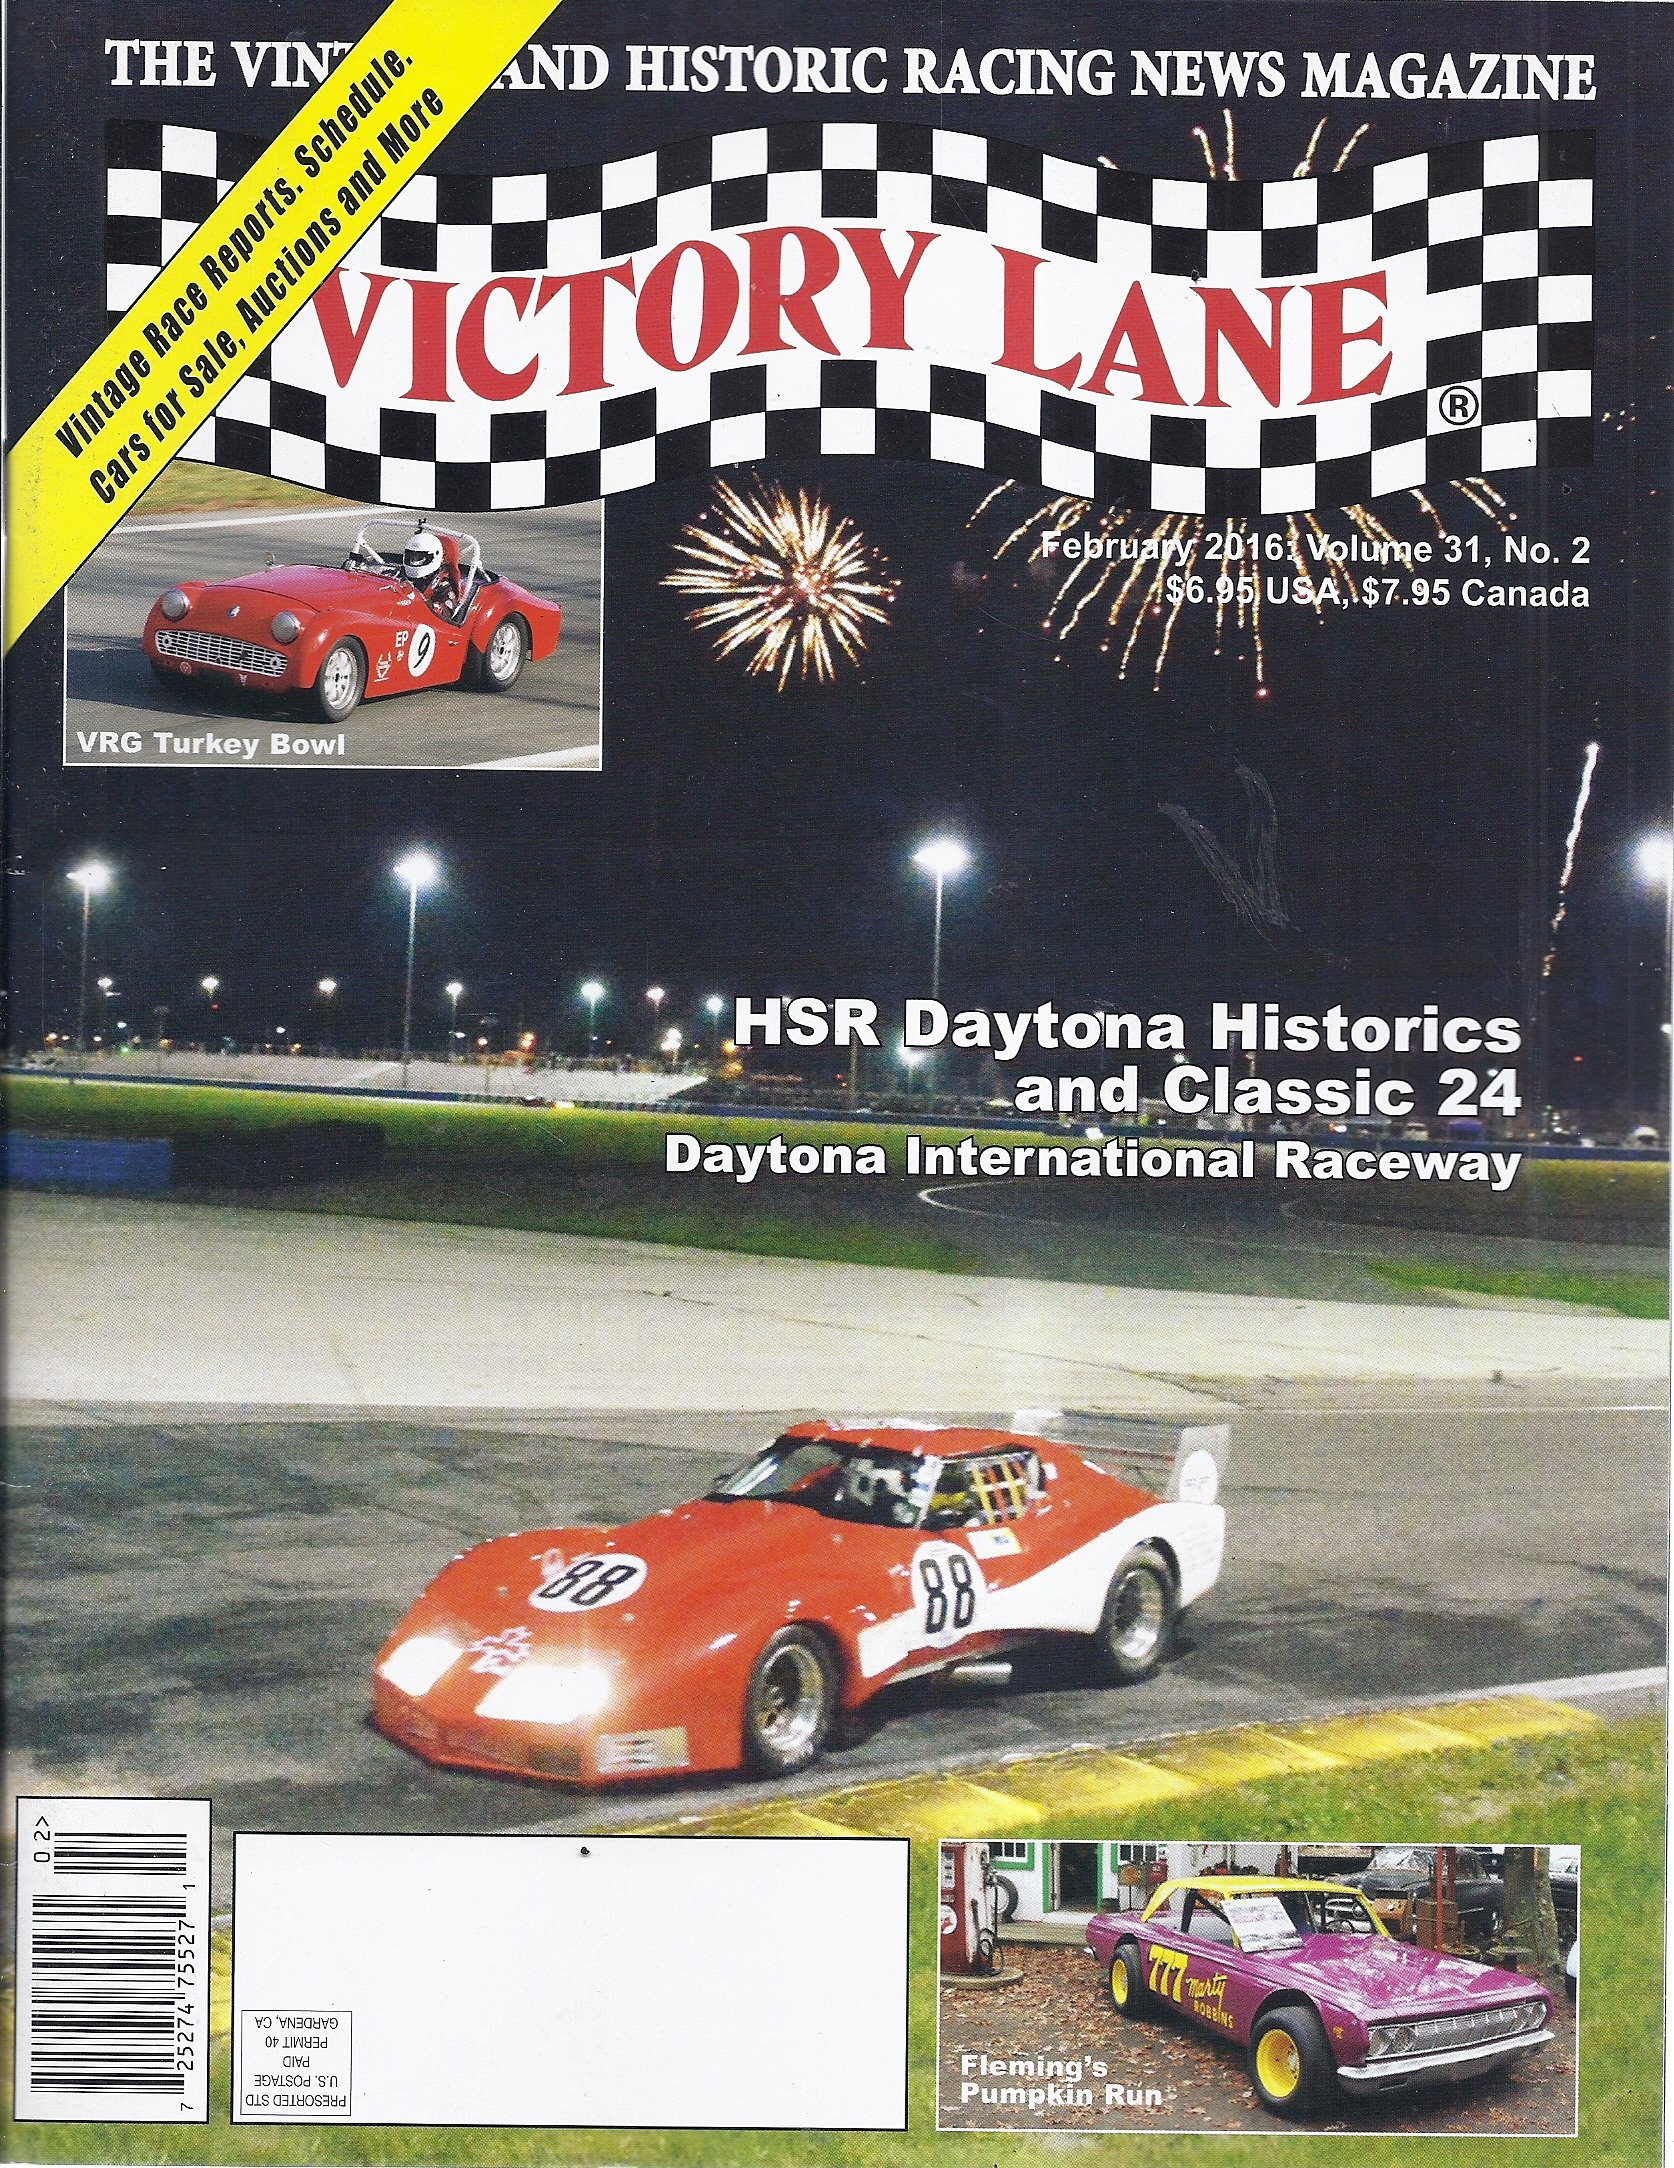 Enchanting Victory Lane Magazine Photo - Classic Cars Ideas - boiq.info